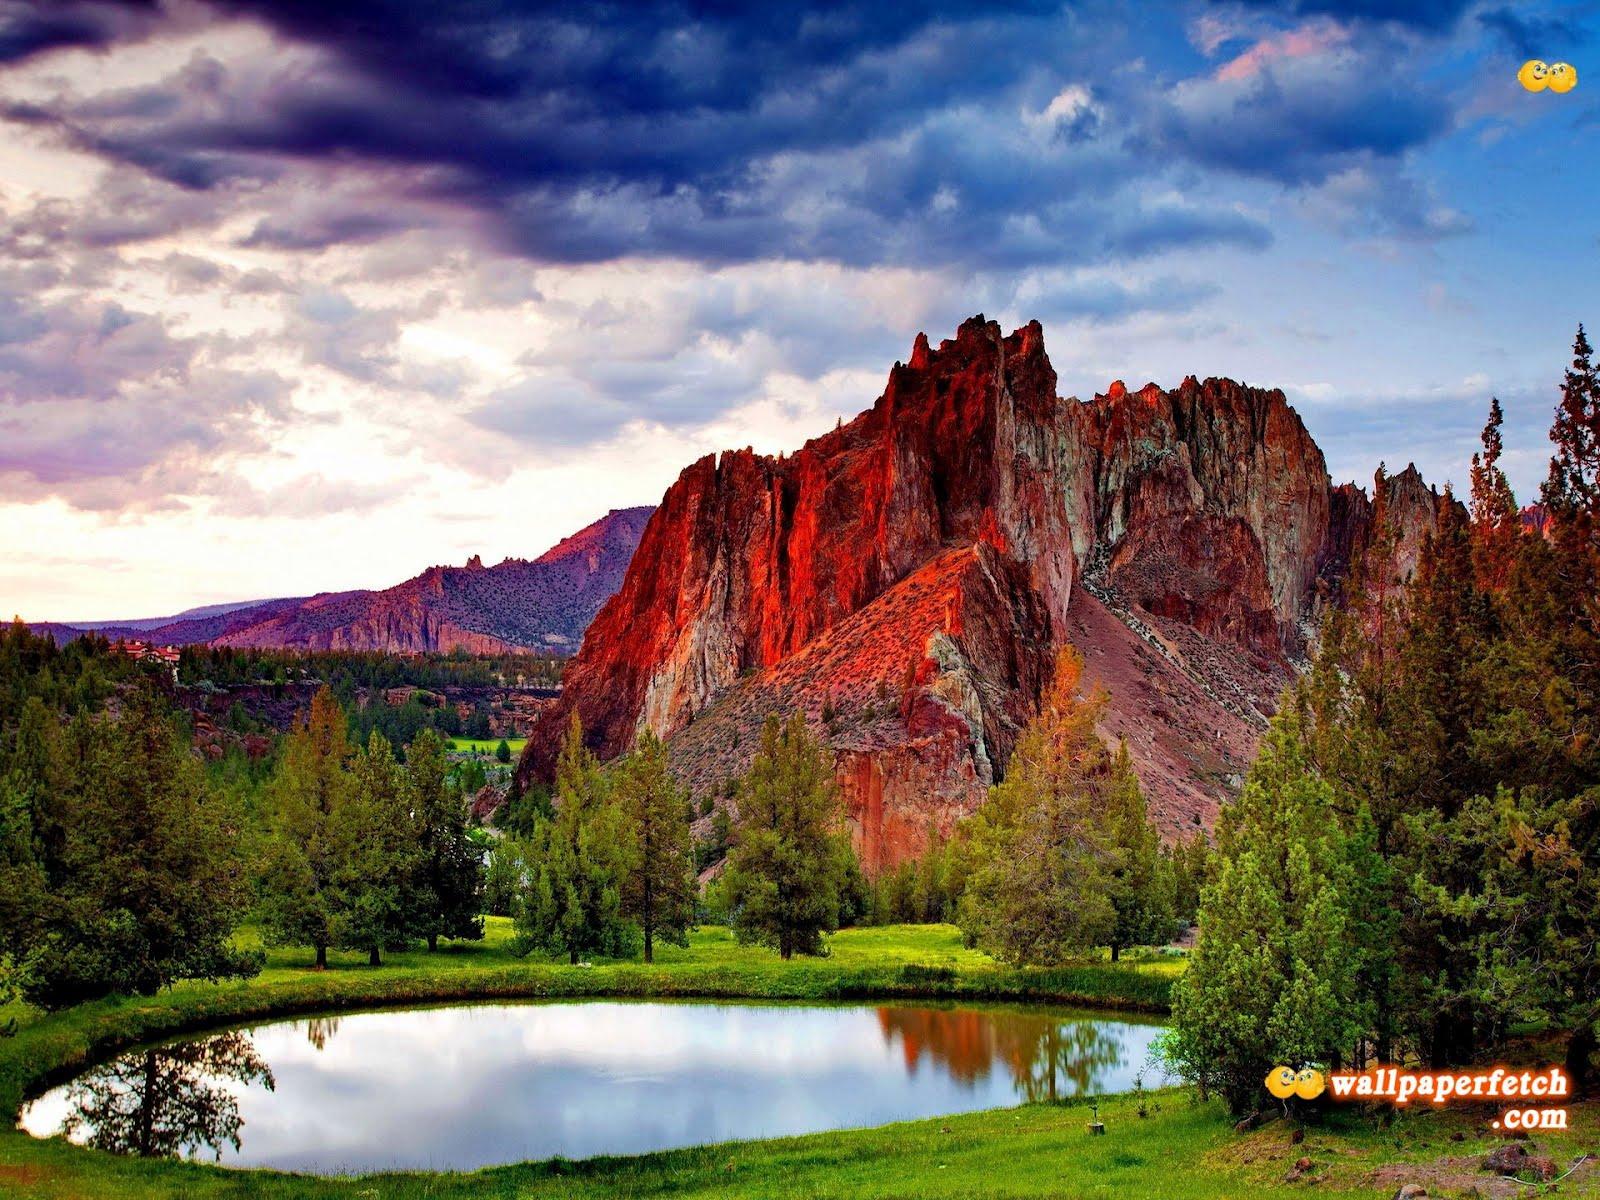 http://2.bp.blogspot.com/-6ci3RUo9KlU/UDKOf38-2FI/AAAAAAAANx4/11p3LiMELcc/s1600/red-rocky-mountain-225033.jpg